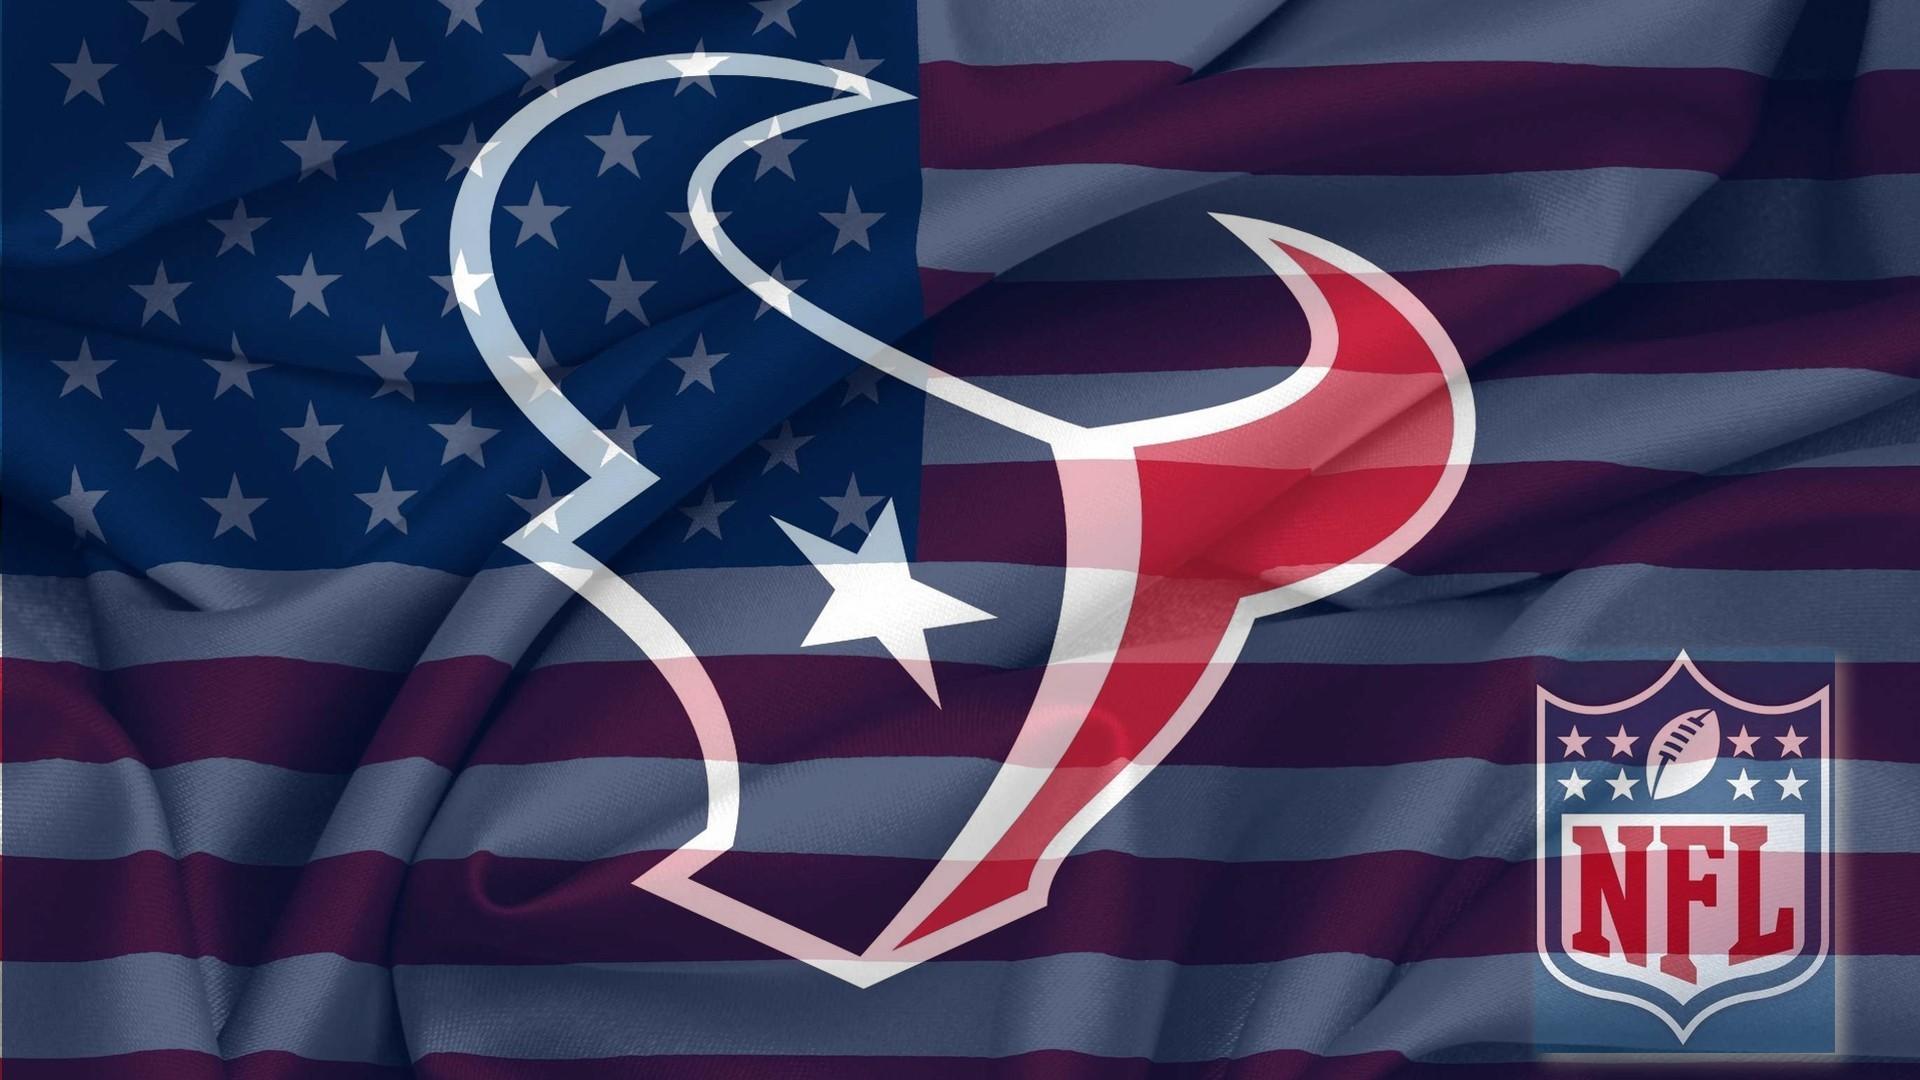 NFL Houston Texans Logo With NFL Logo On USA American Flag